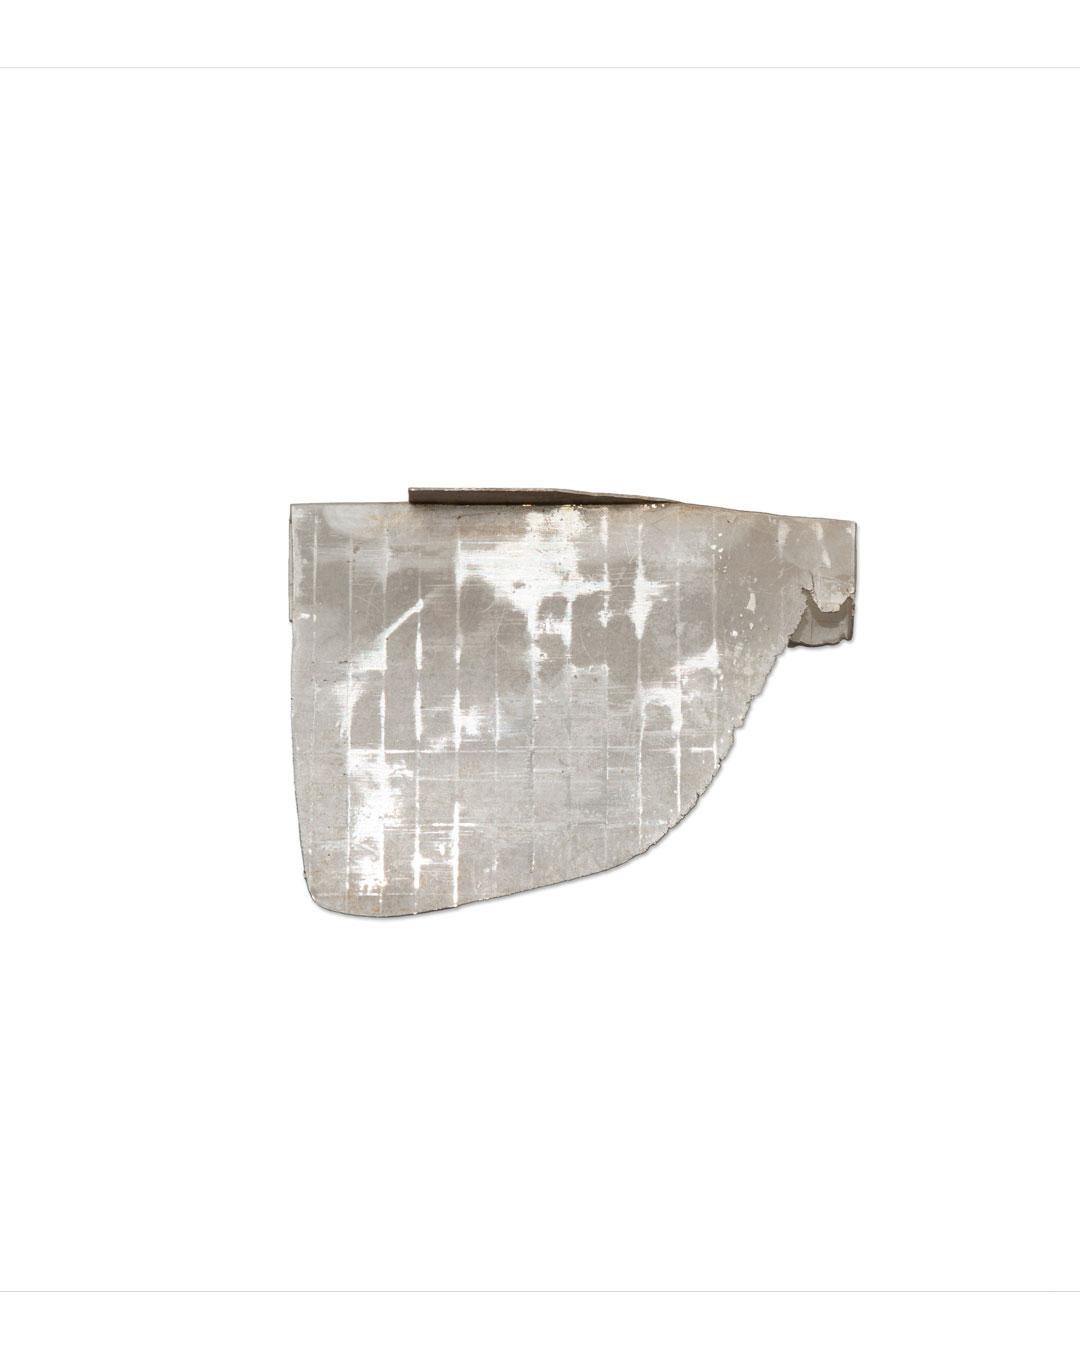 Noam Elyashiv, Edge, 2017, brooch; reclaimed silver, 18ct gold, 50 x 38 x 6 mm, €1350